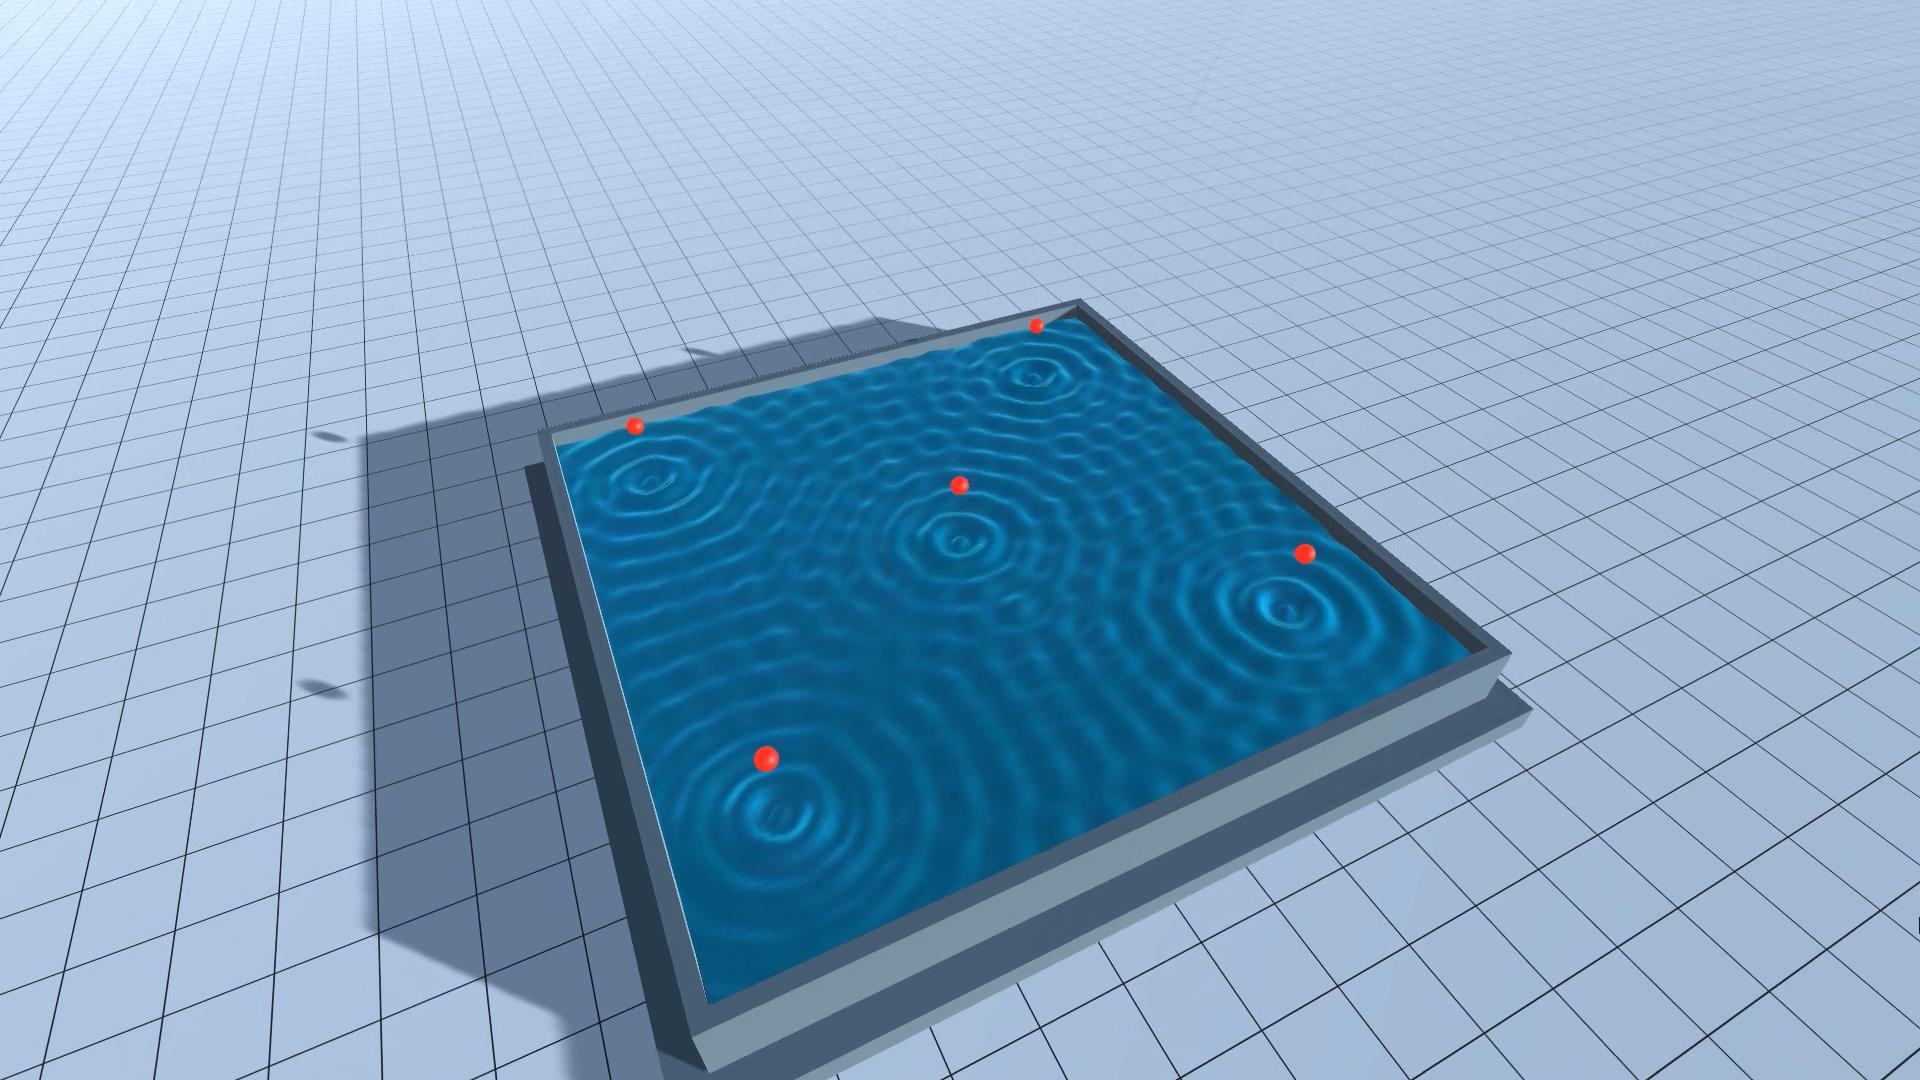 konsfik-procedural-water-surface-unity3d-snapshot-5